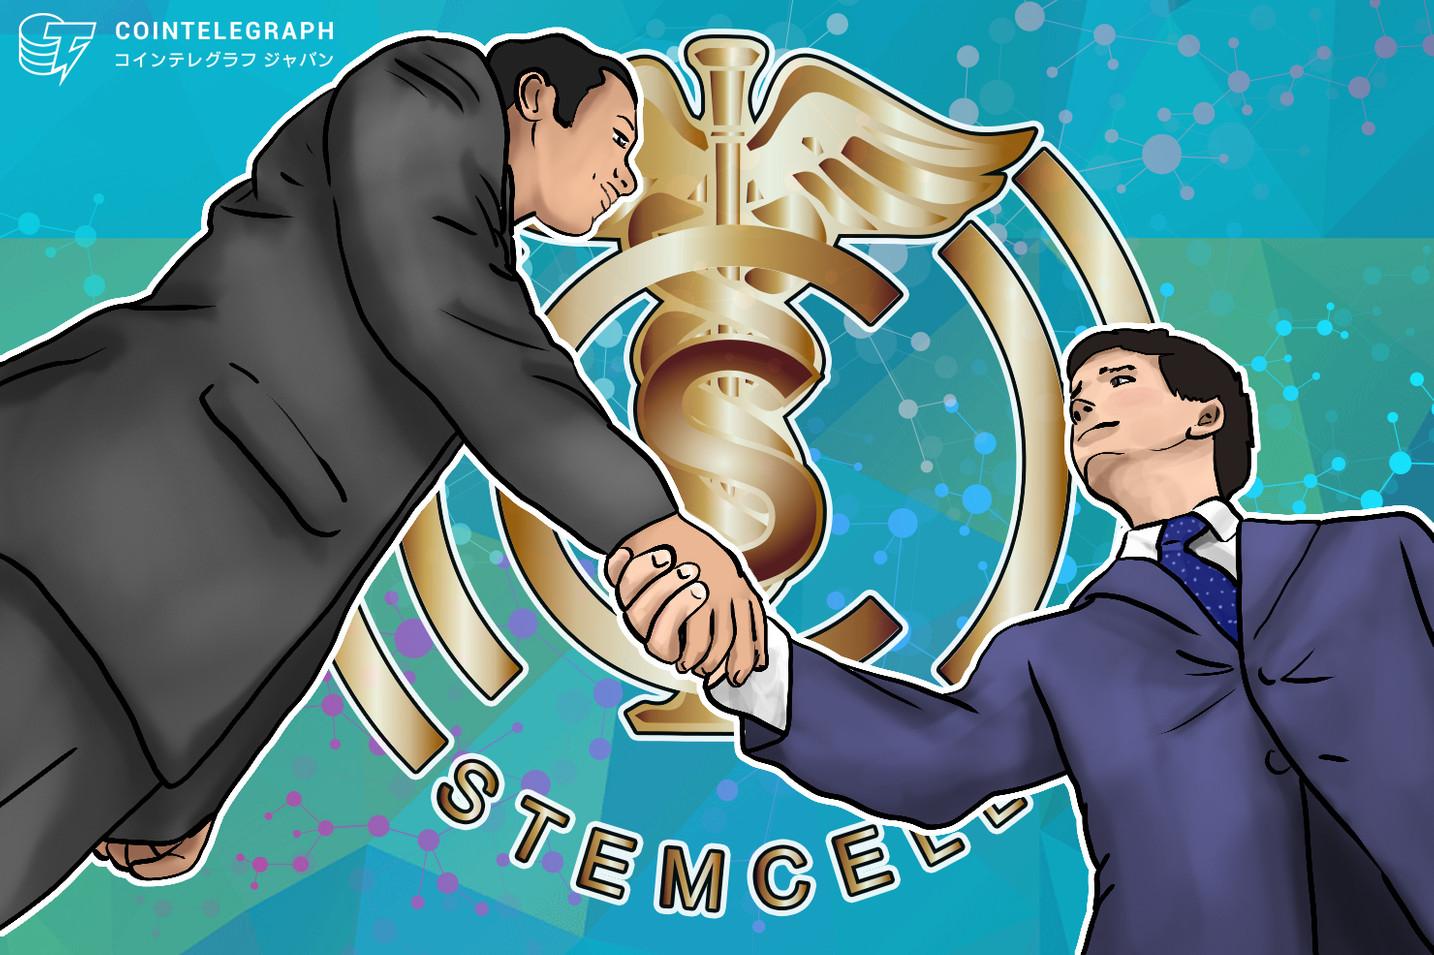 STEM CELL PROJECTのRMDC社、JASDAQ上場企業のイメージワン社と業務提携契約を締結。香港に再生医療センター開業も決定